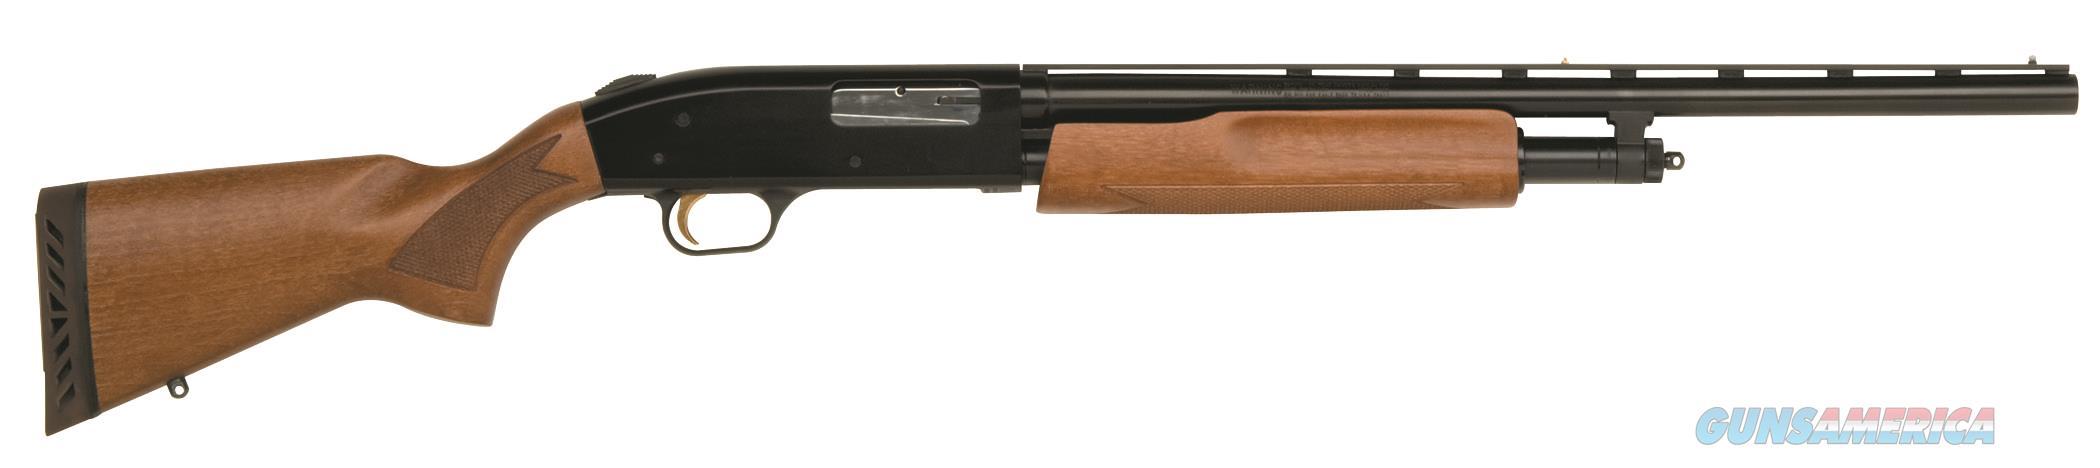 Mossburg 505 Youth 20ga Pump  Guns > Shotguns > Mossberg Shotguns > Pump > Sporting